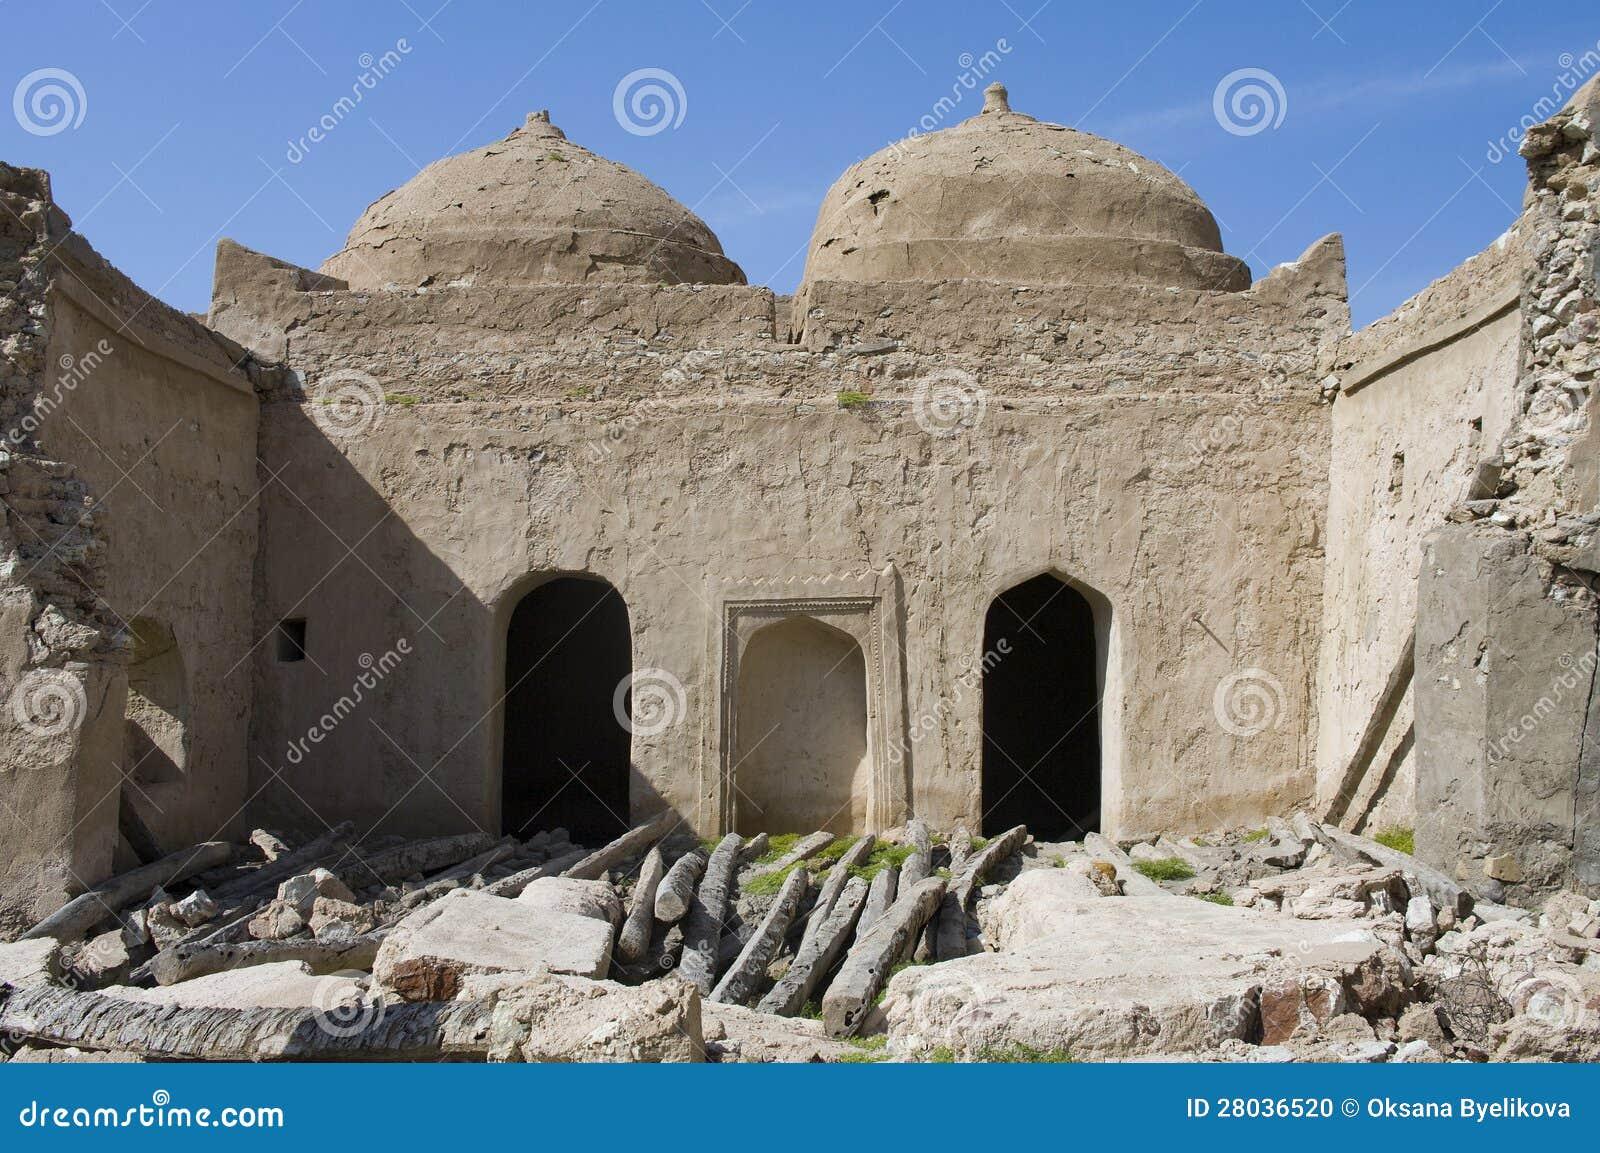 Fort jalan bani bu ali hammouda al qala sultanate of oman middle